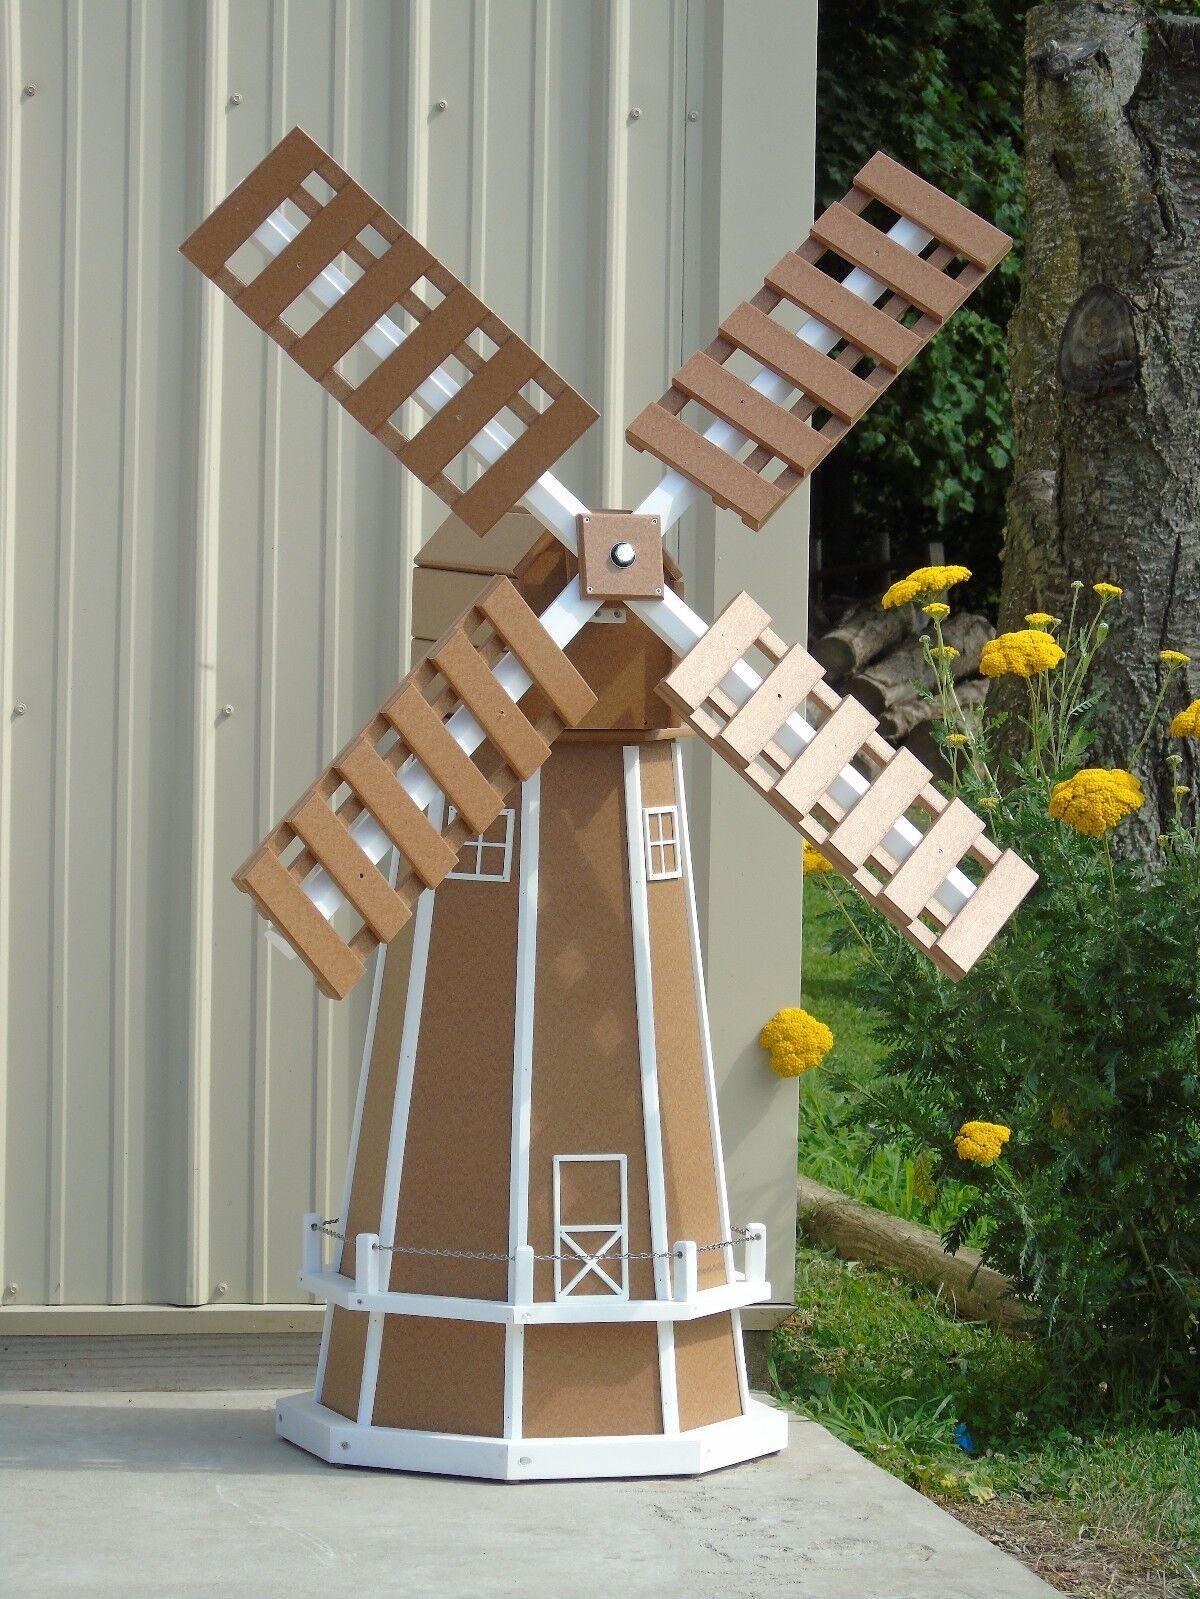 5 ft. Octagon (8 sided) Polywood Dutch Windmill (Carmel with White Trim)